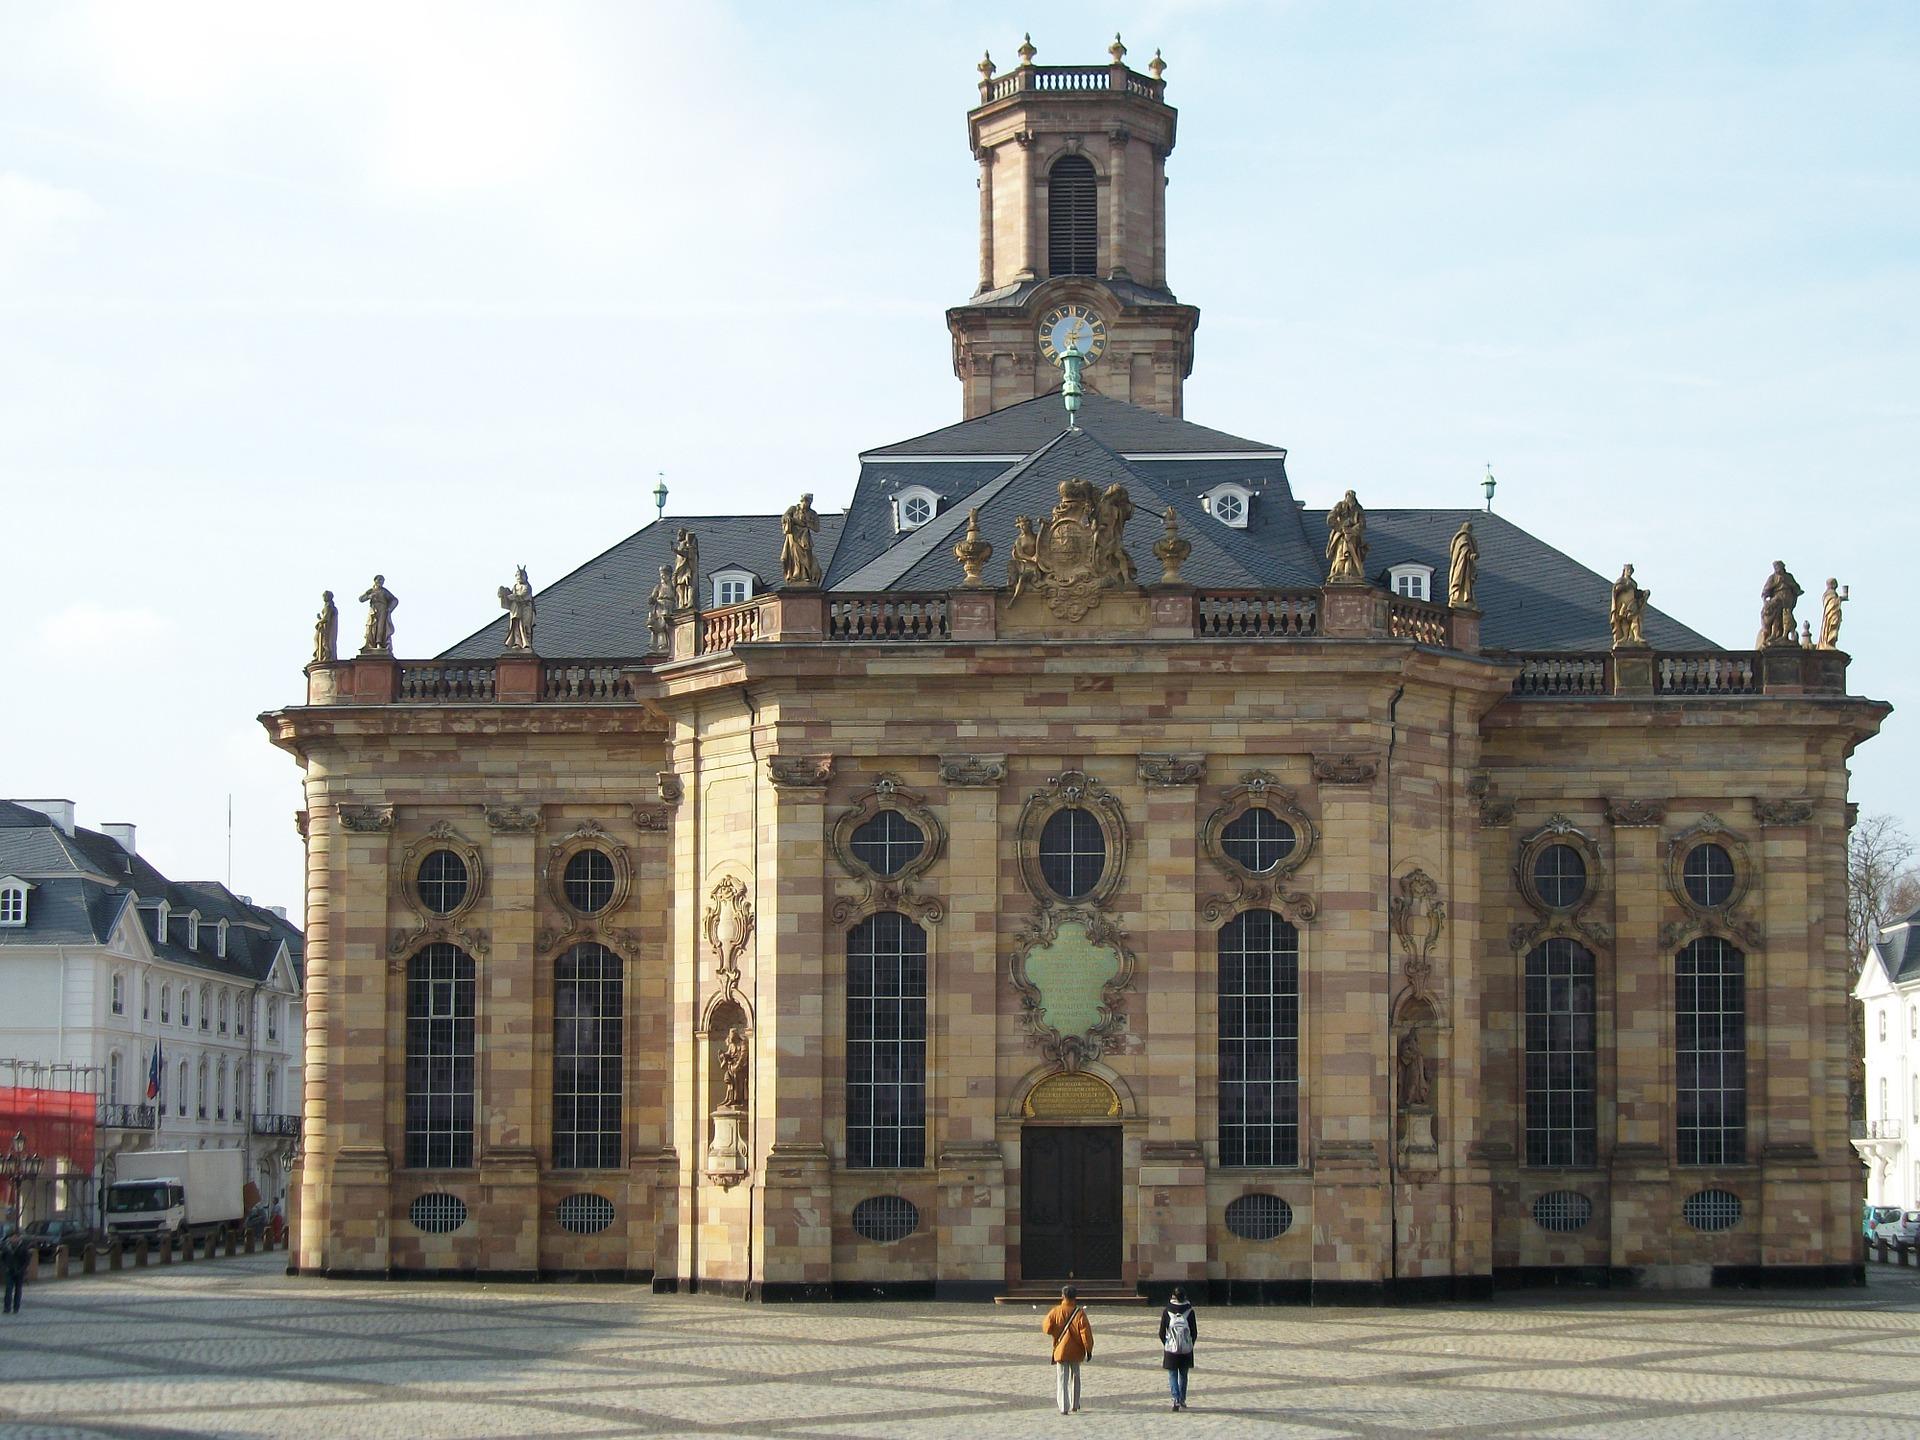 Die brühmte Ludwigskirche in der Landeshauptsadt Saarbrücken